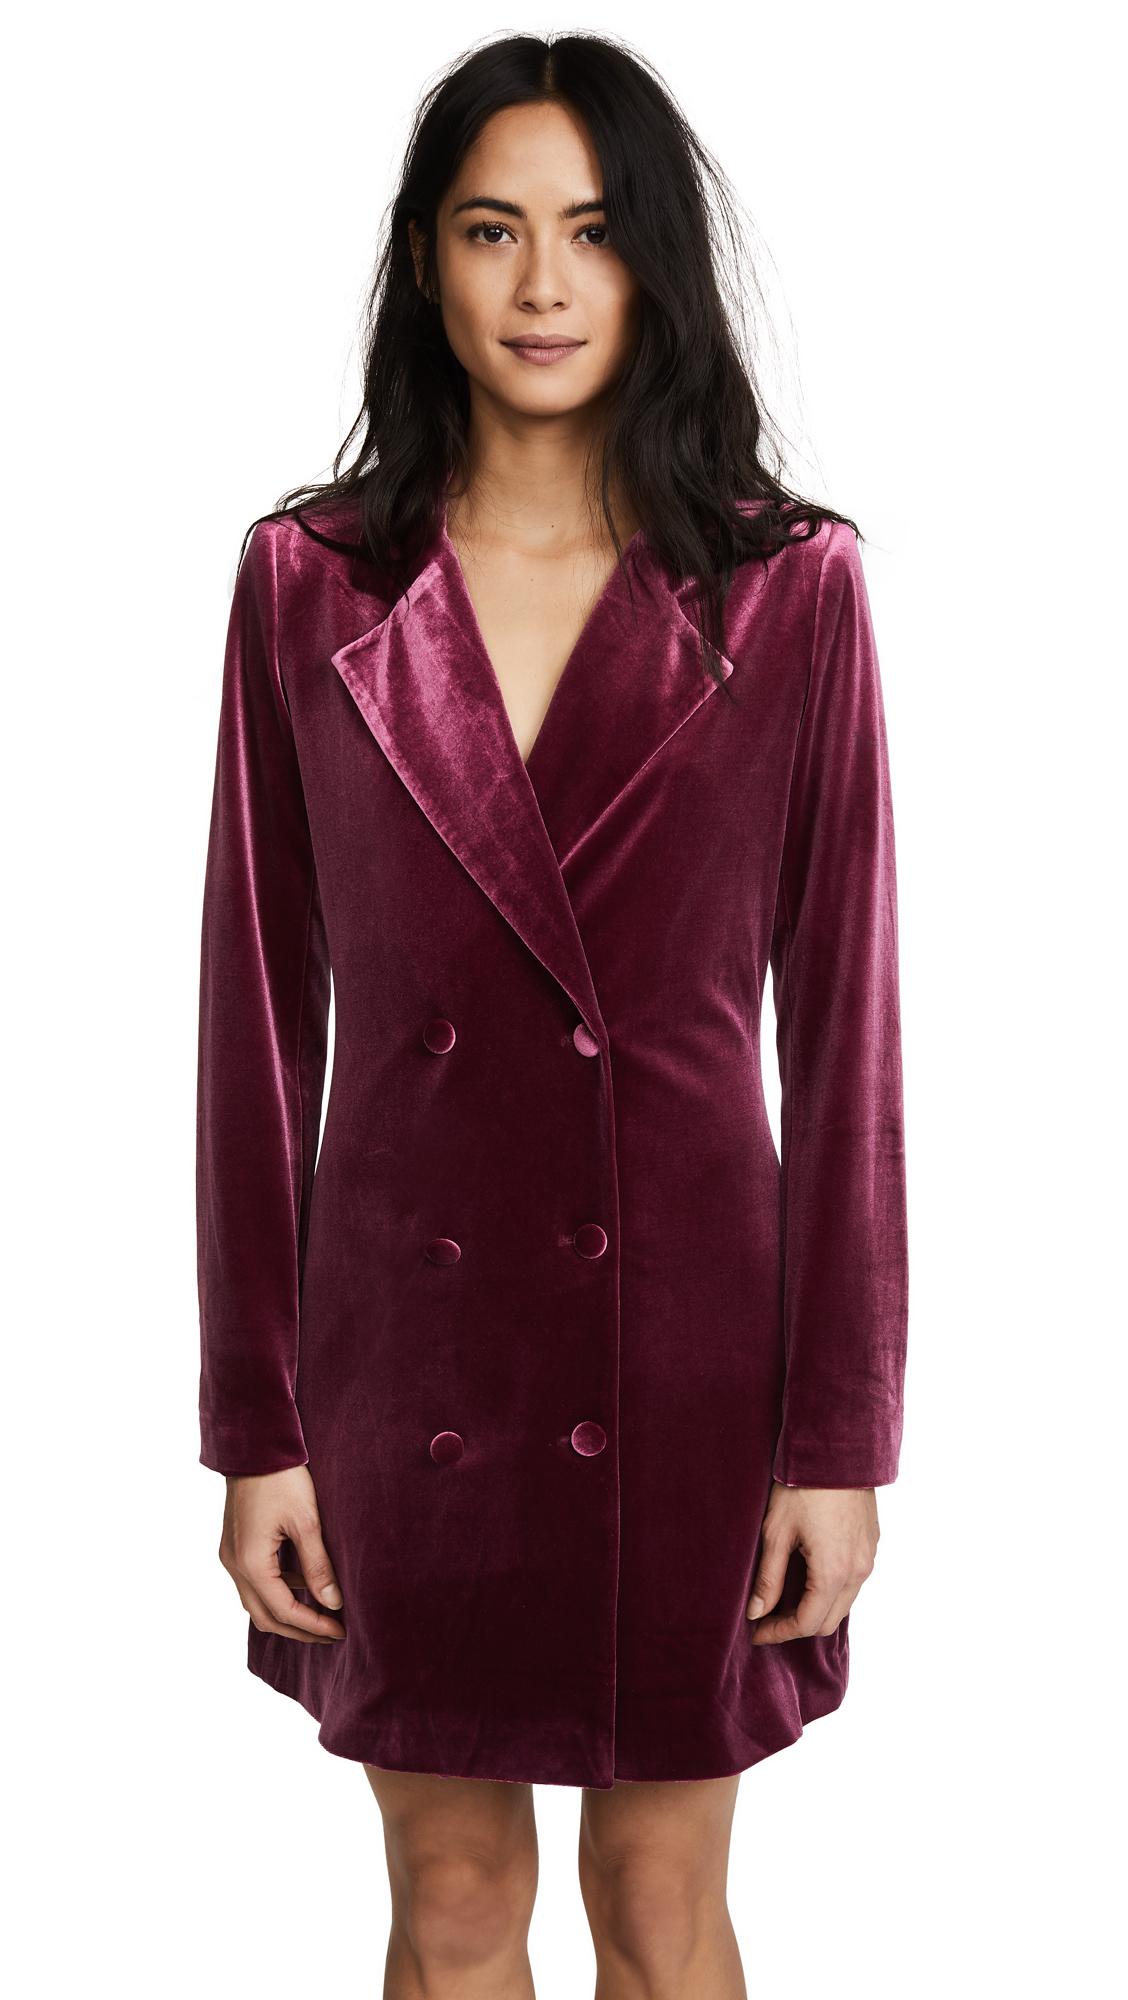 Yumi Kim Suit Up Dress - Burgundy